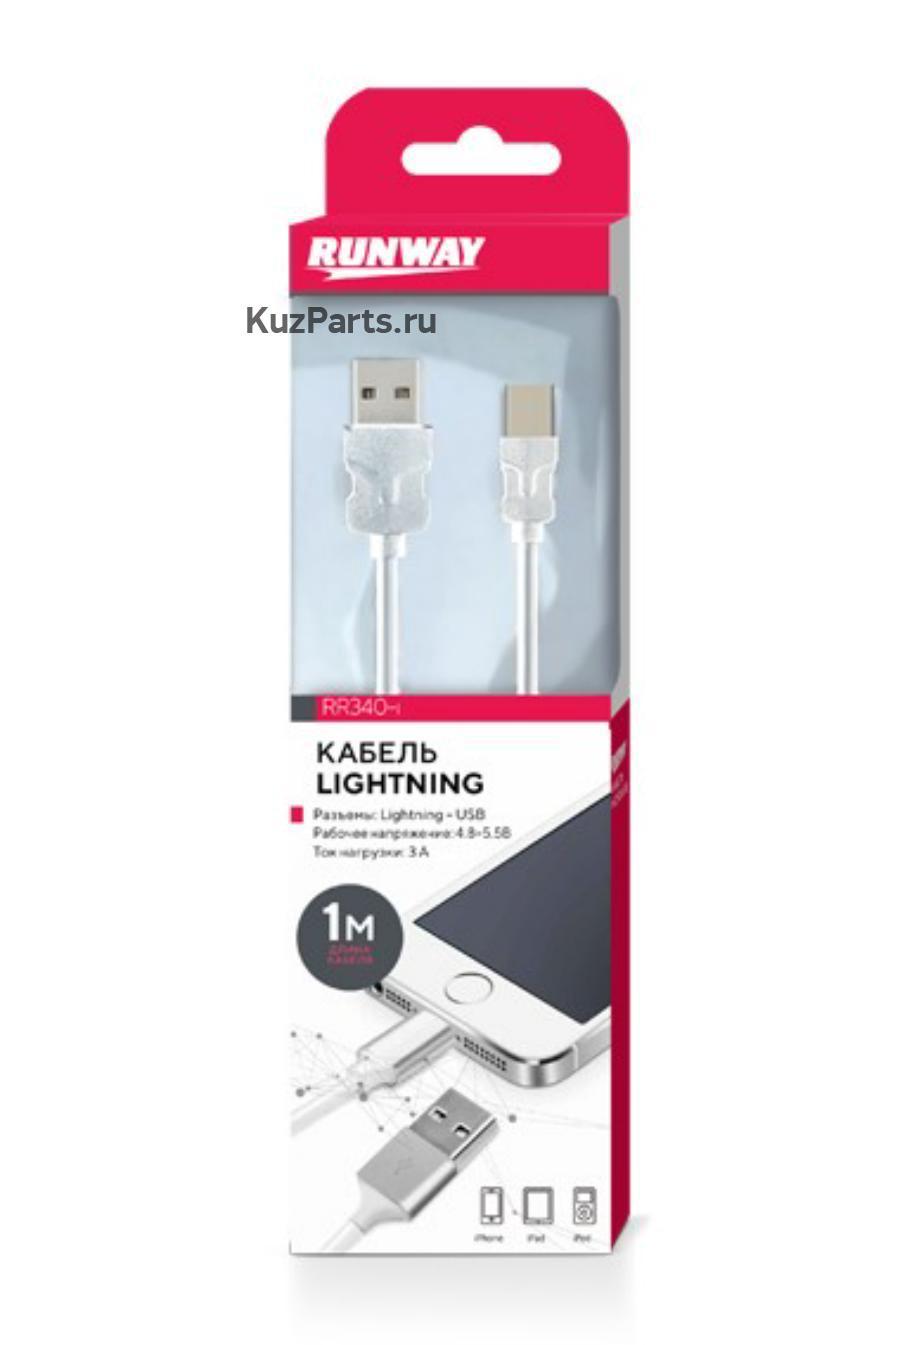 Кабель Lightning, для iPhone/iPad/iPod, 1м, белый